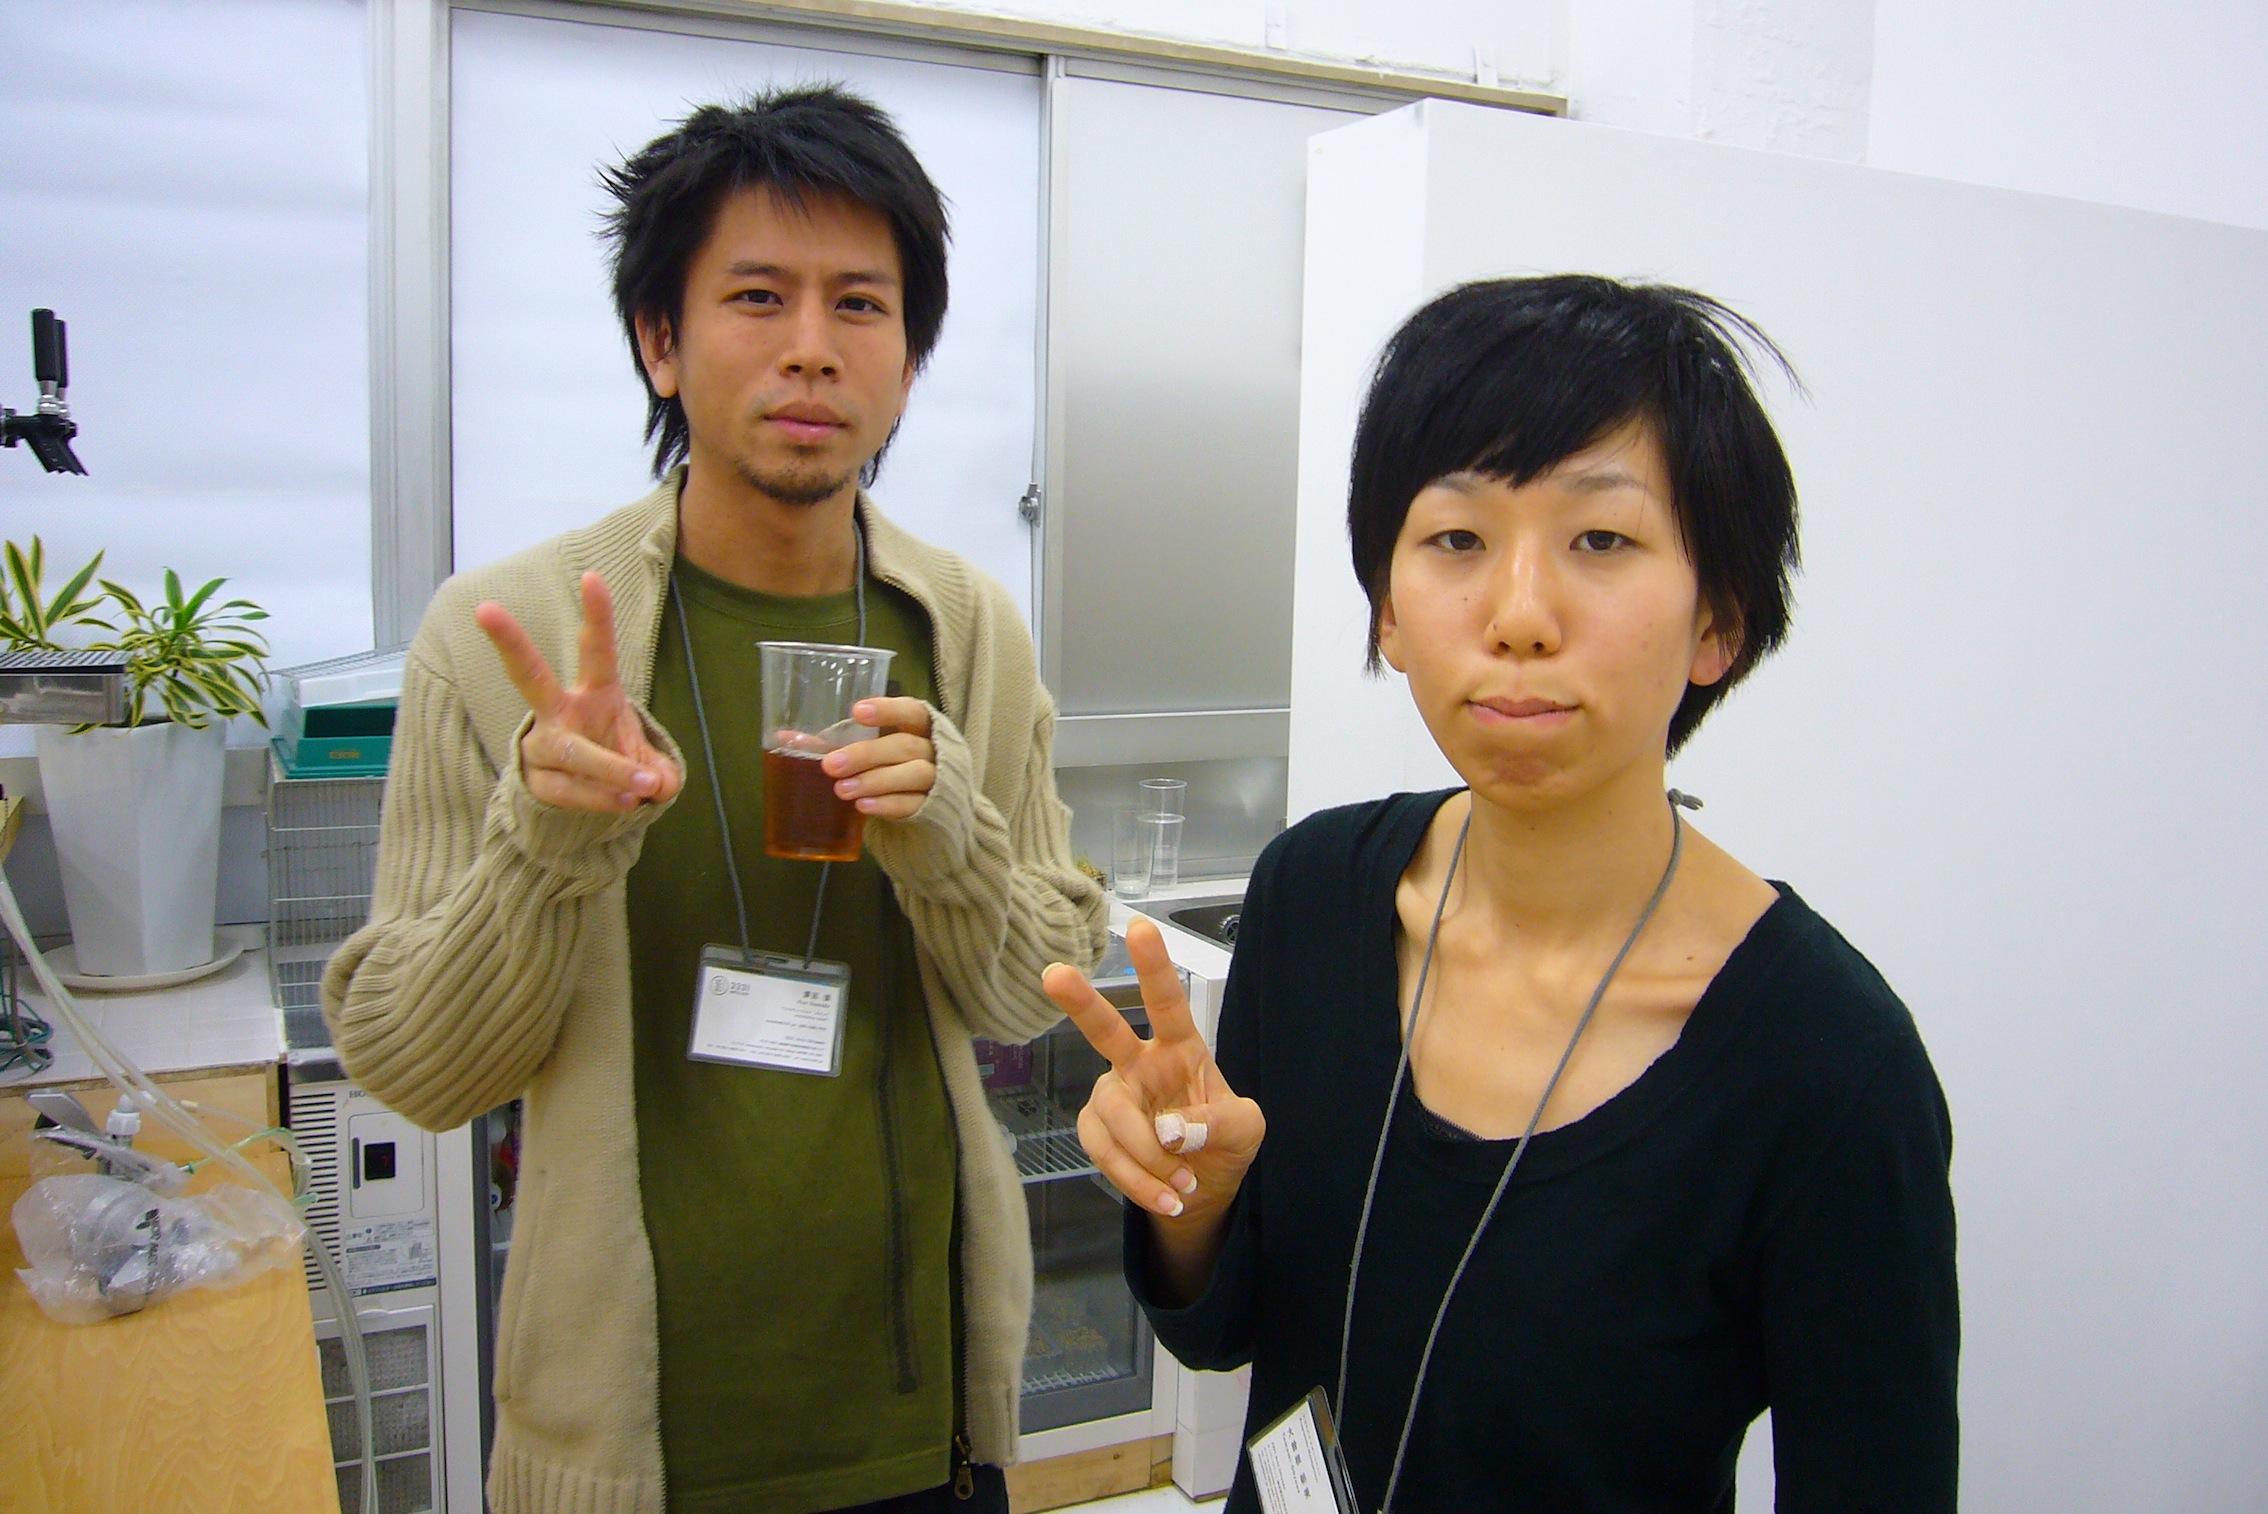 http://blog.3331.jp/staff/file/P1030429.JPG